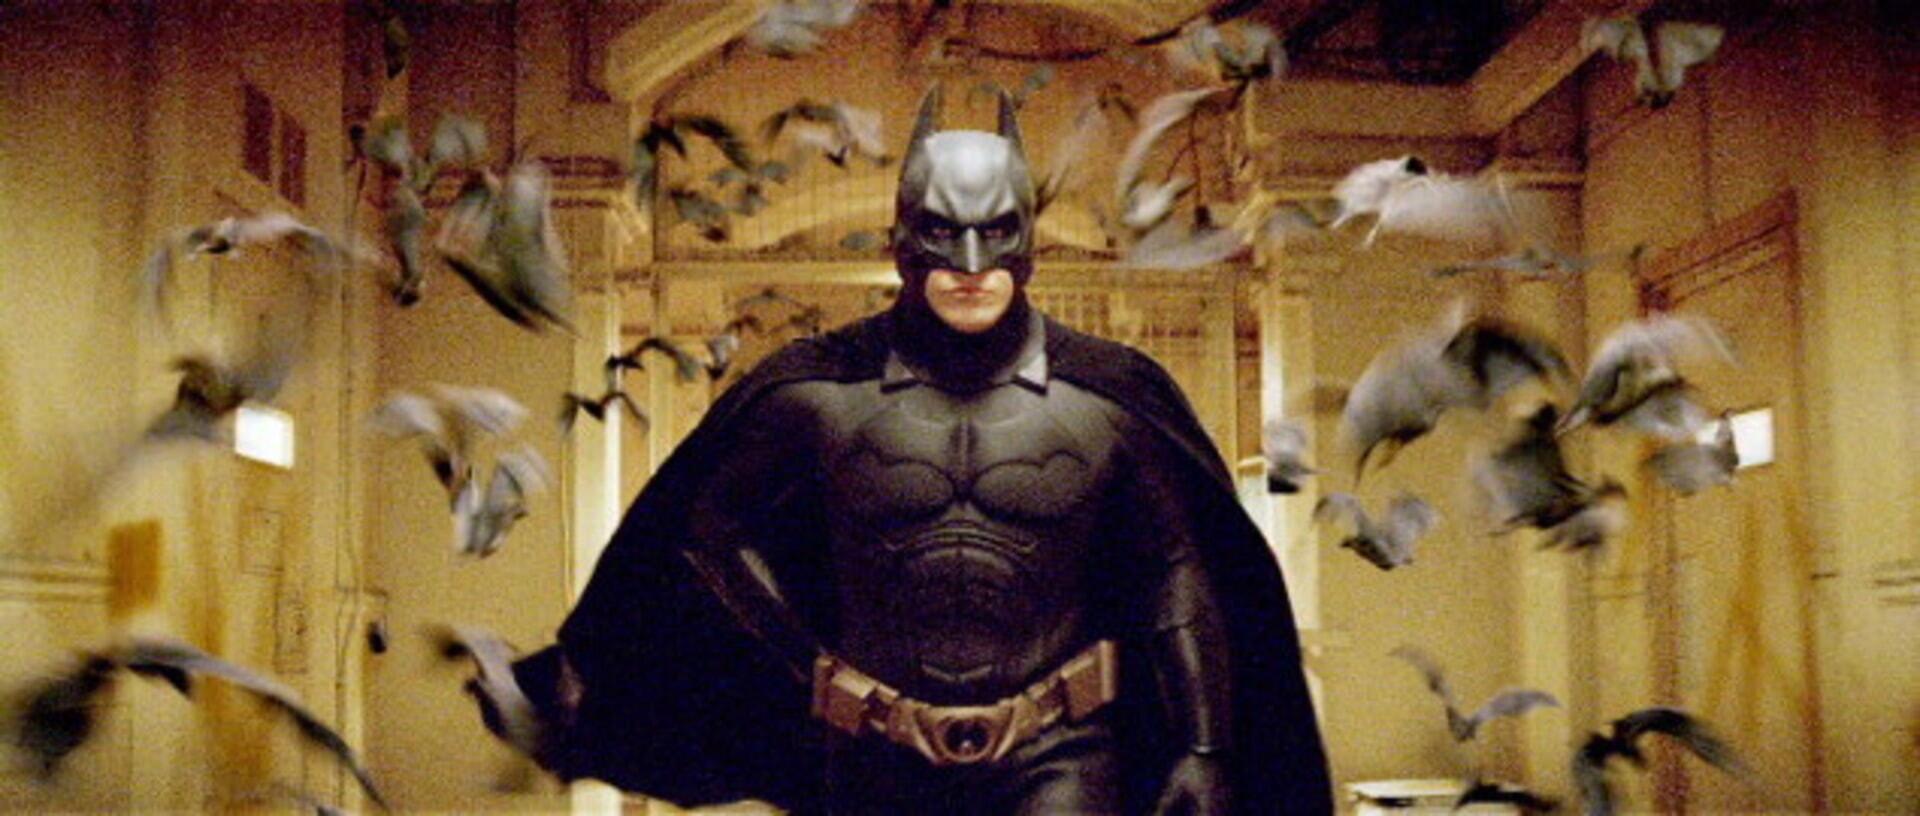 Batman Begins - Image 47